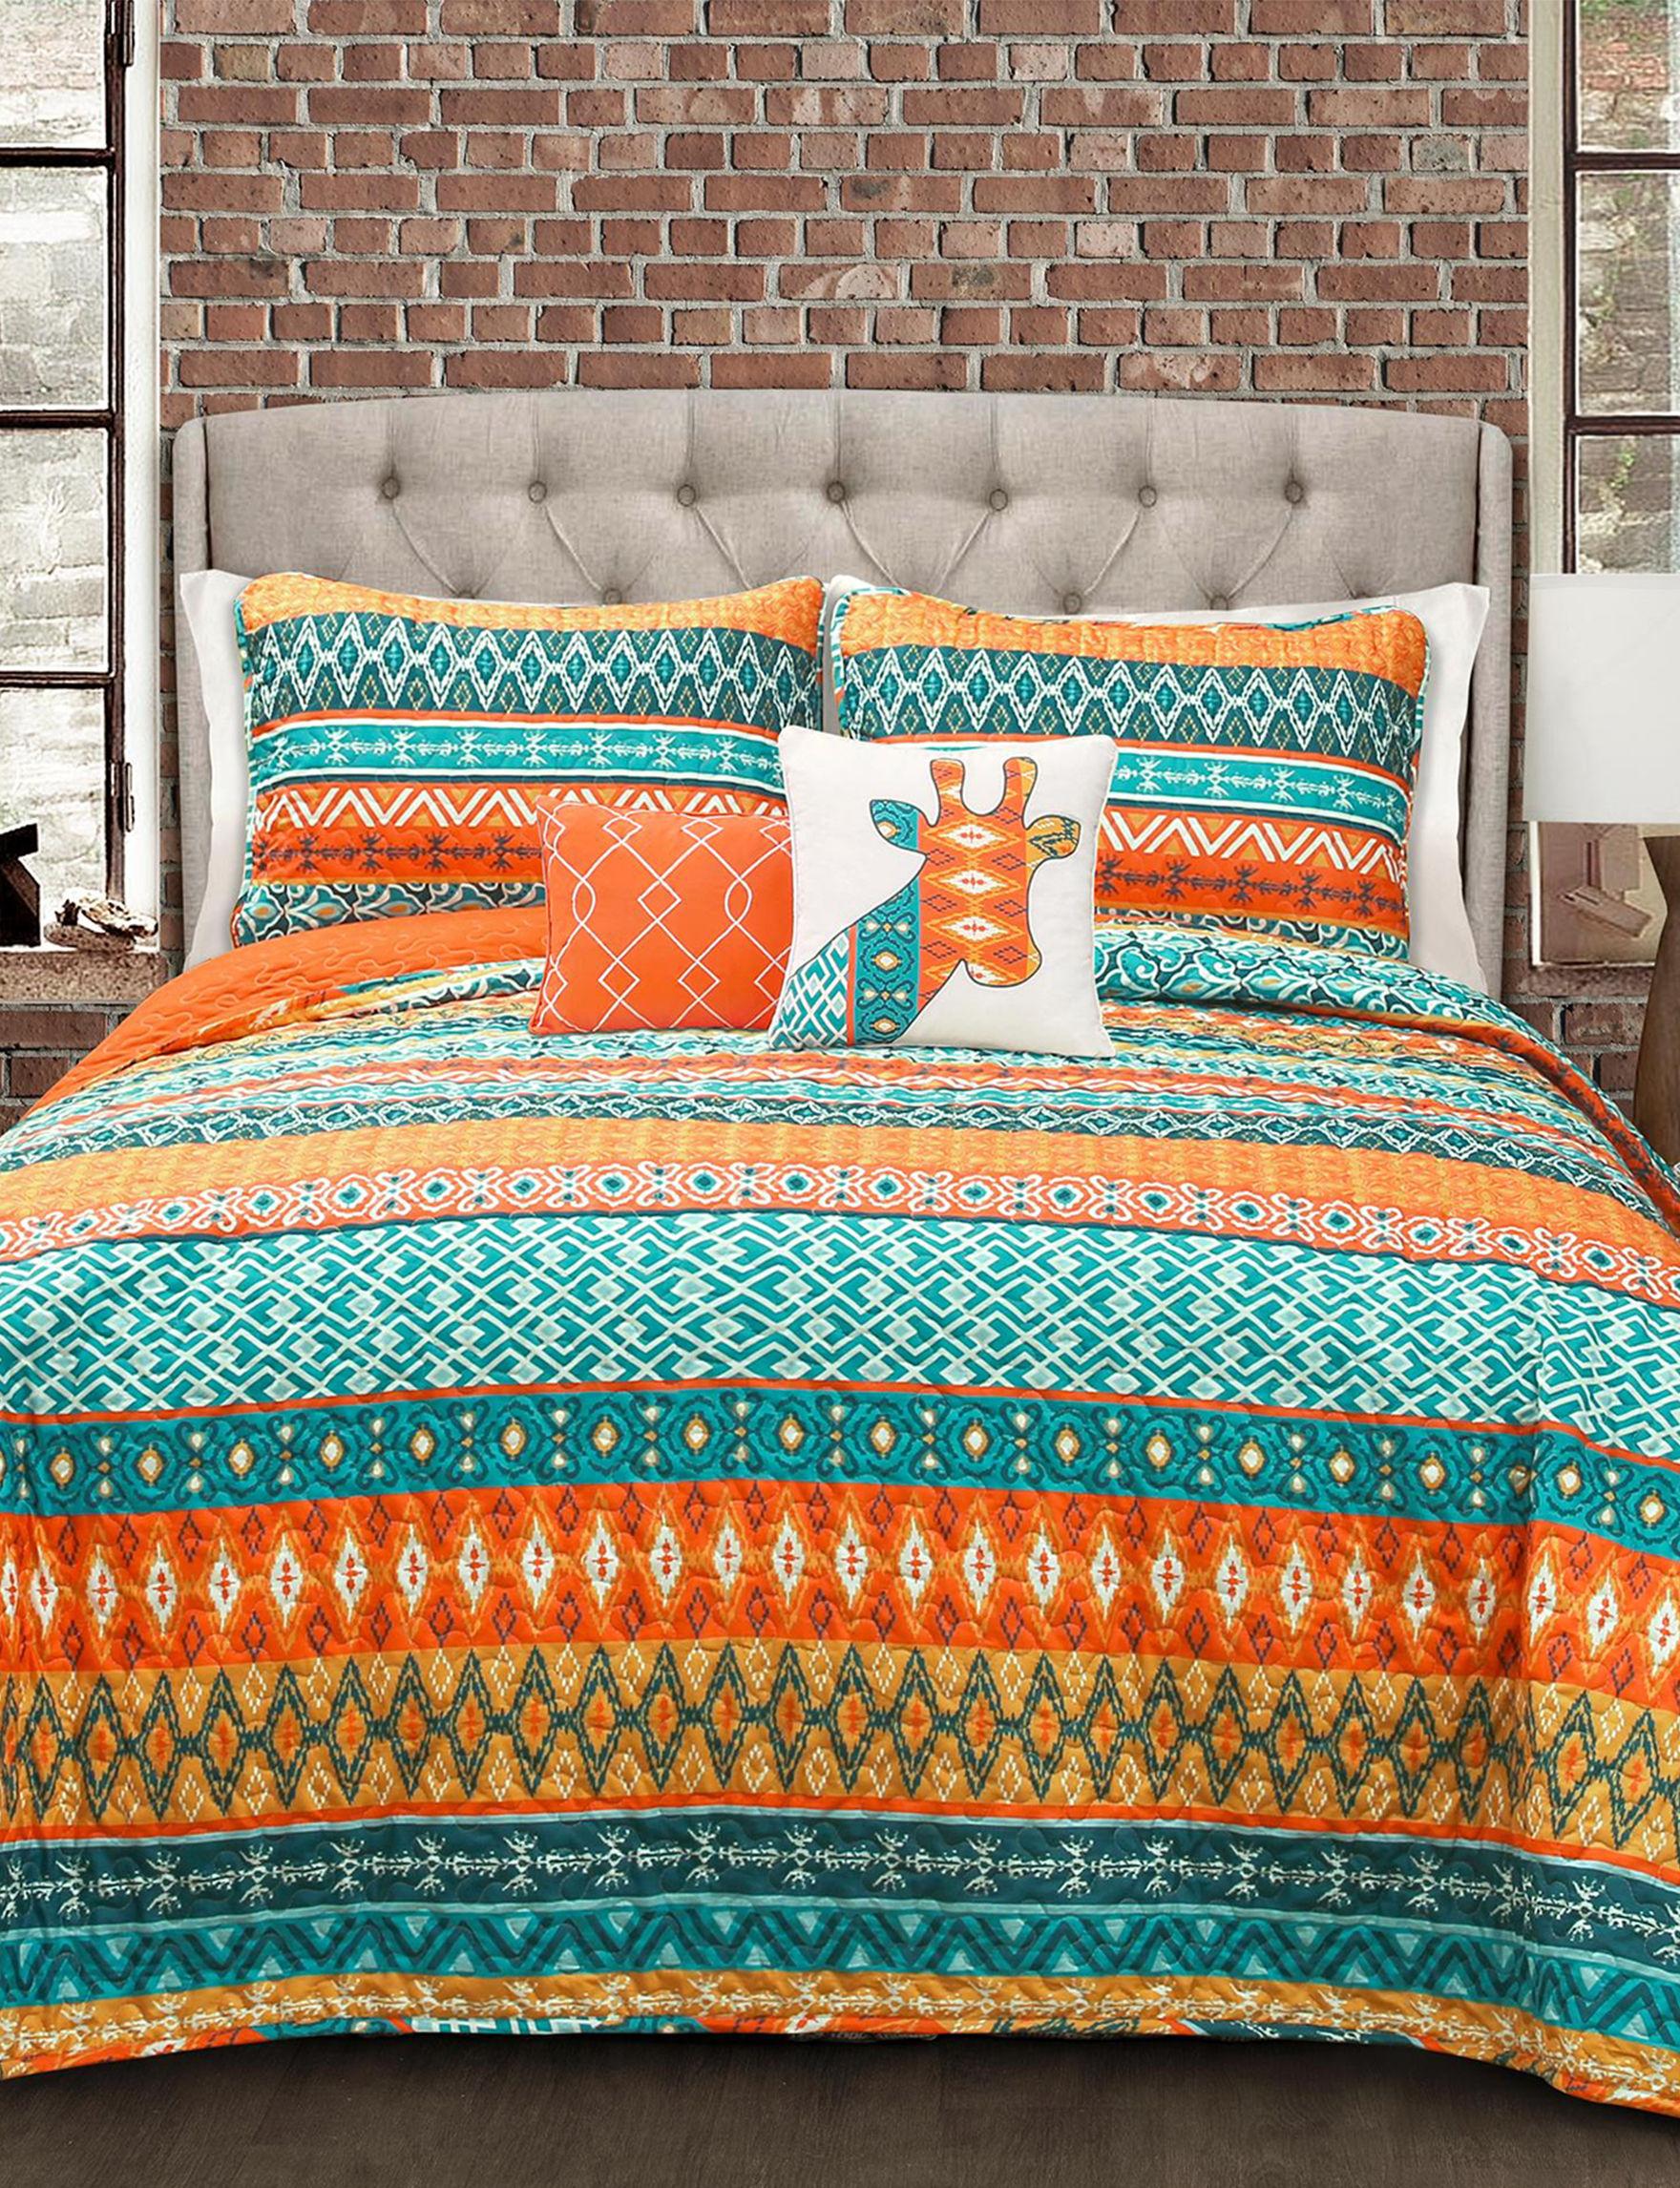 Lush Decor Turqouise Quilts & Quilt Sets